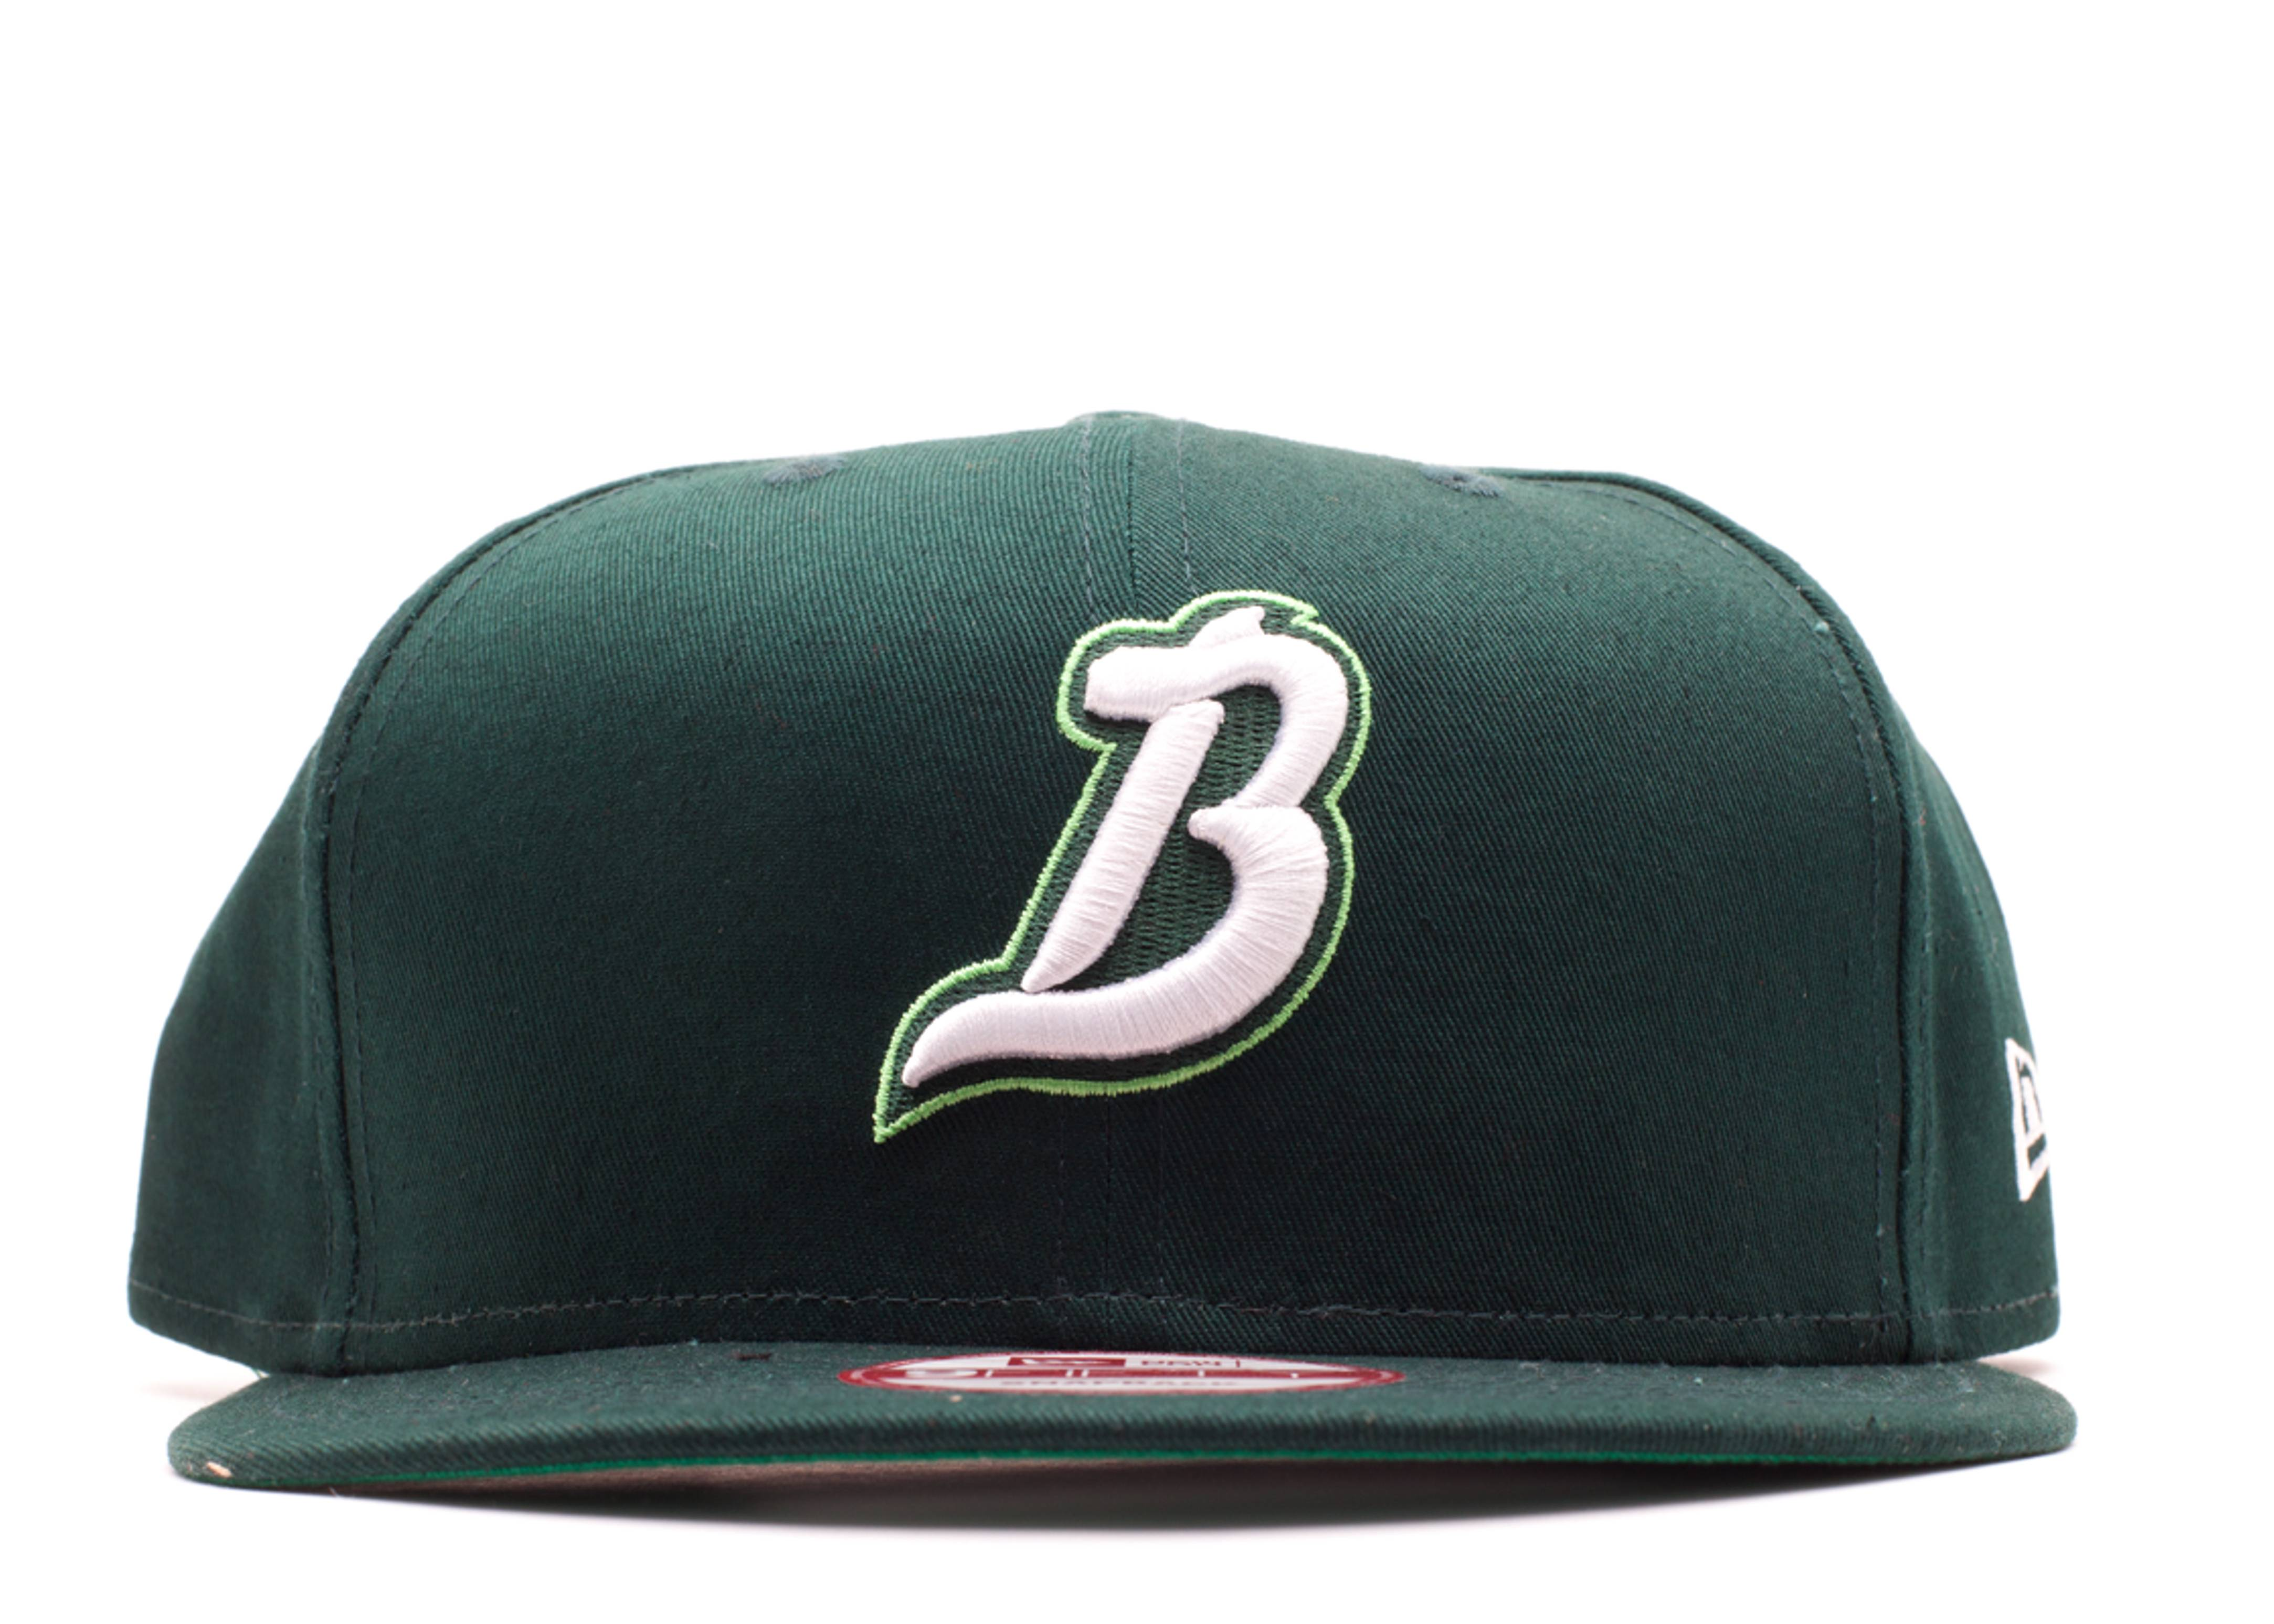 reynosa broncos mexican league snap-back